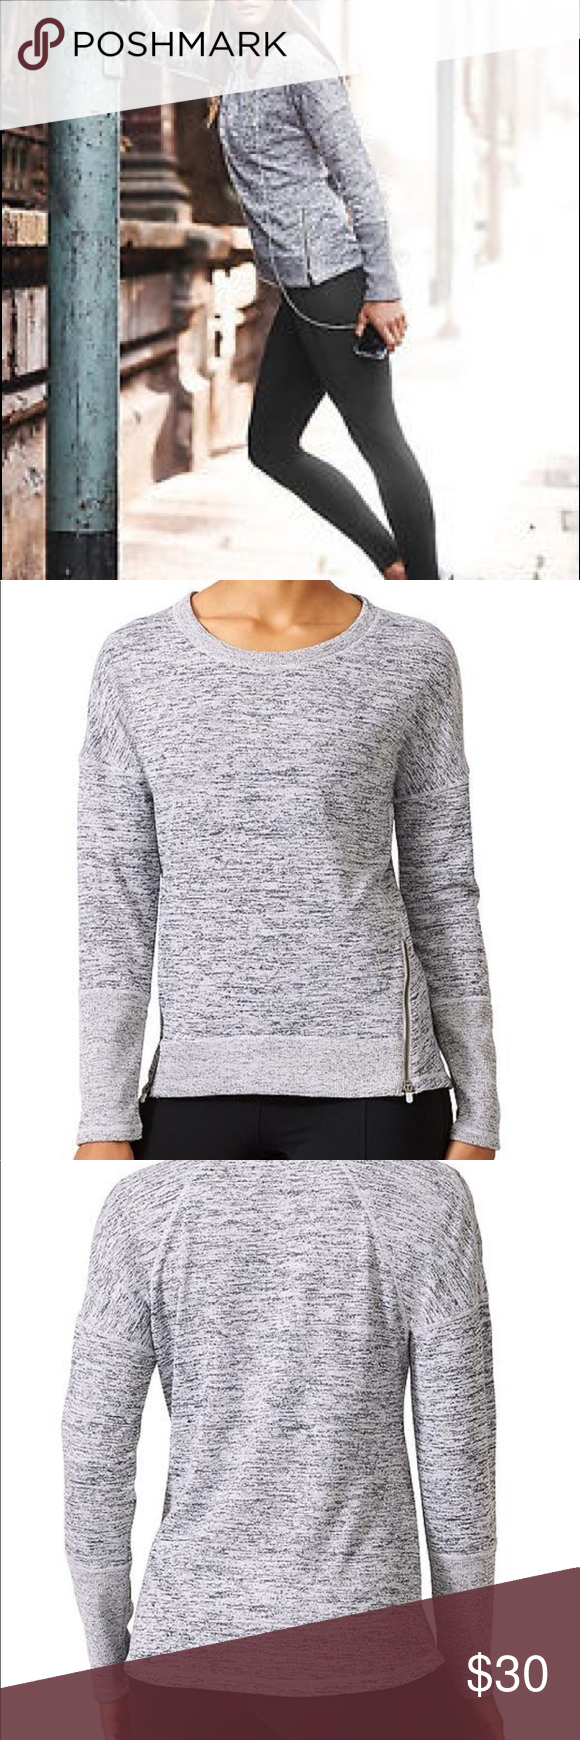 Athleta Blissful Sharkbite Women S Sweatshirt Sweatshirts Women Clothes Design Sweatshirts [ 1740 x 580 Pixel ]